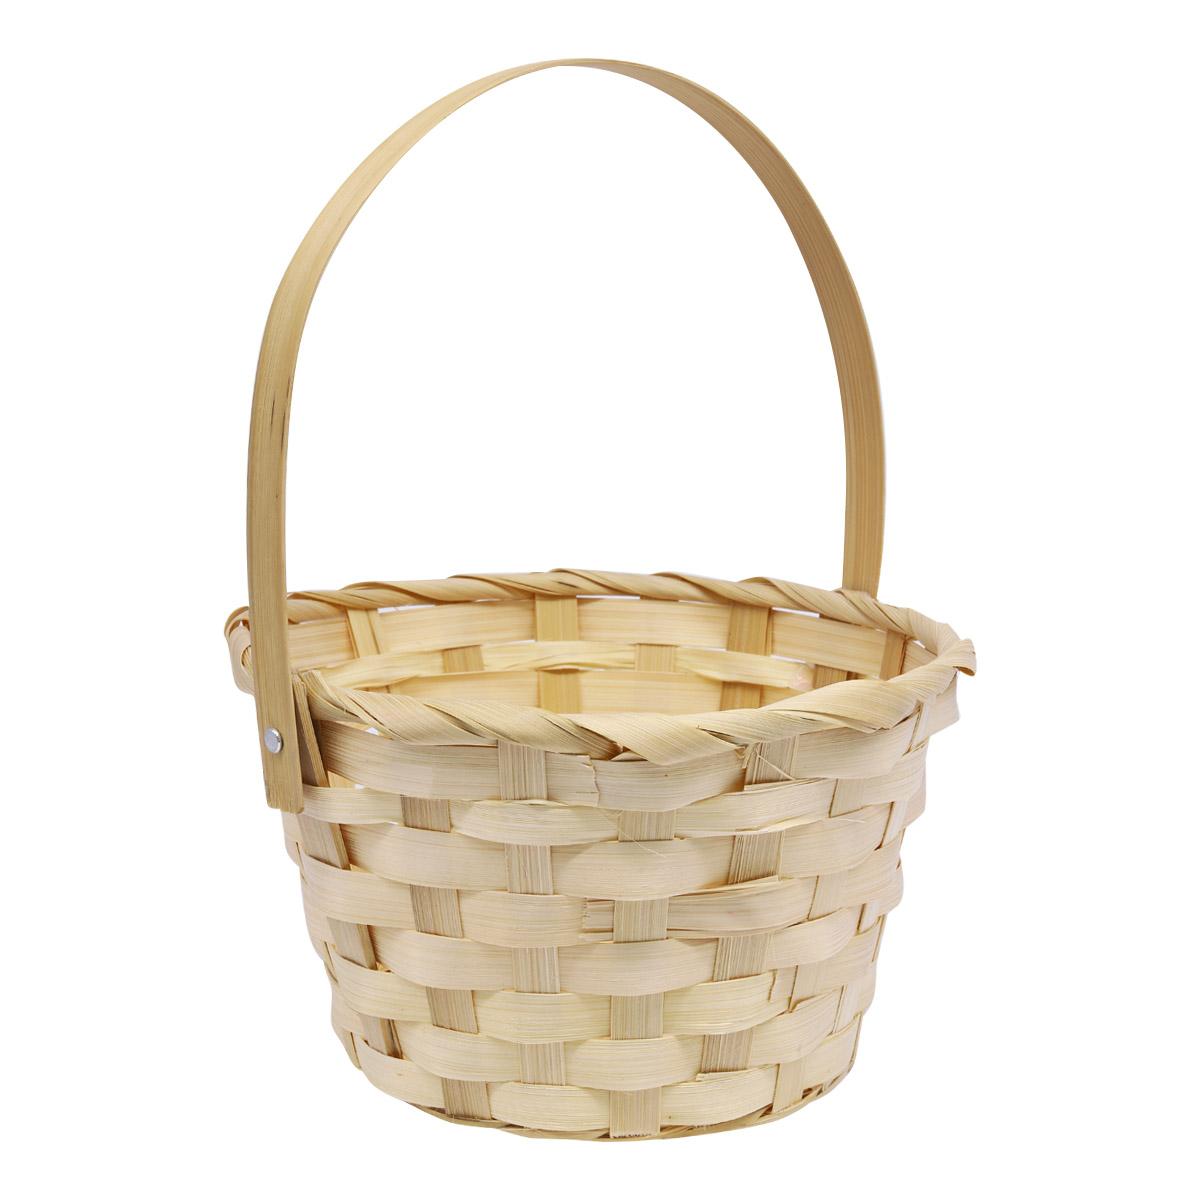 19HJ19087-1 Корзина плетеная бамбук 18*10*H25см, цв. натуральный Астра